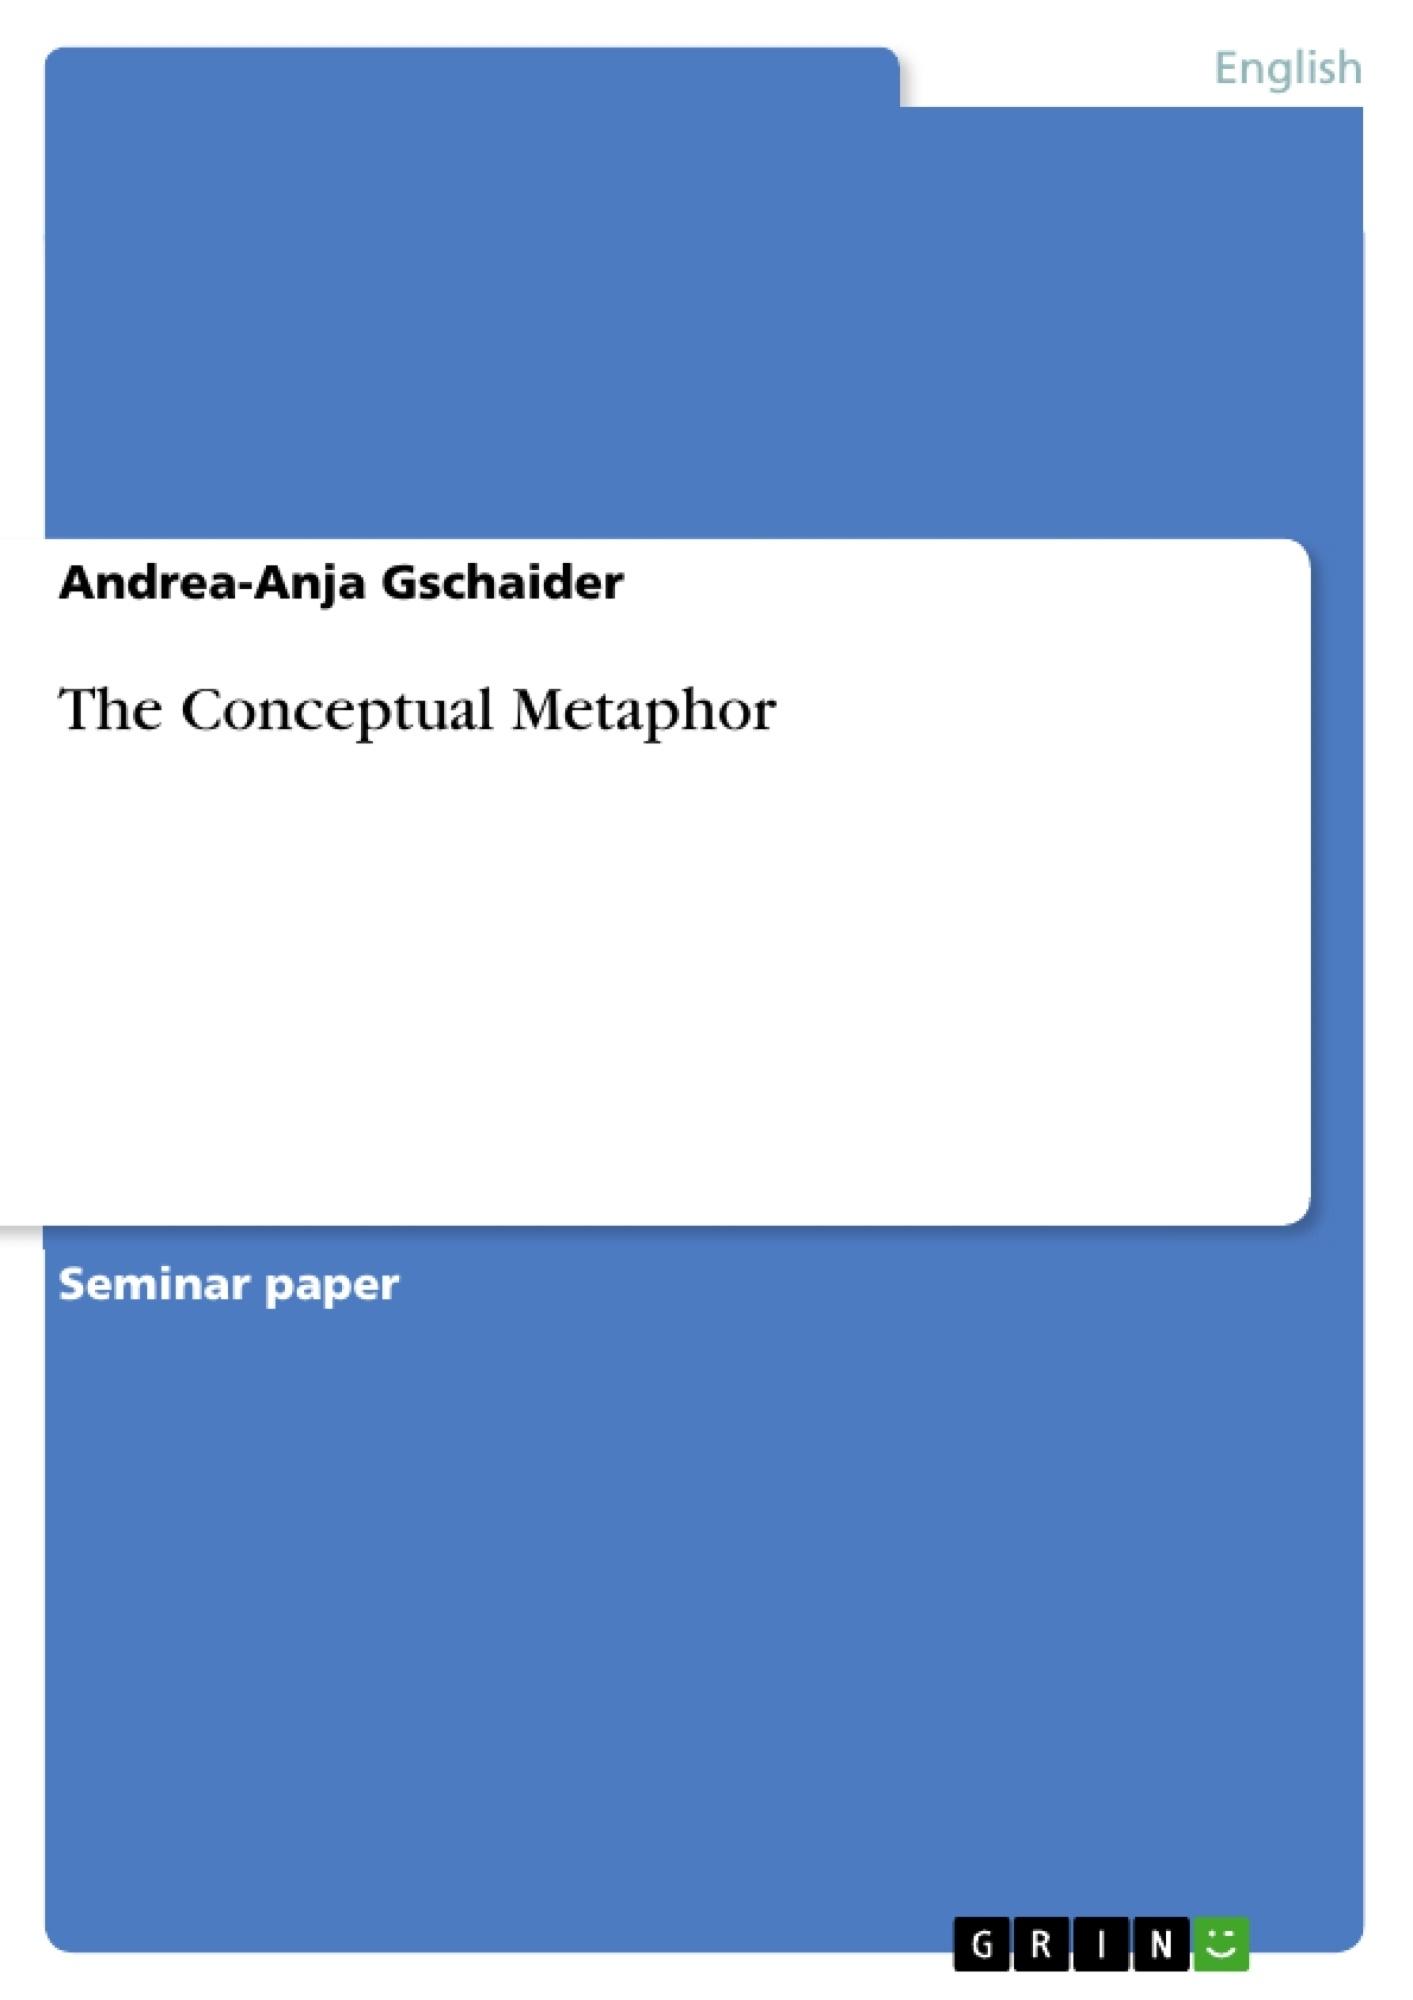 Title: The Conceptual Metaphor